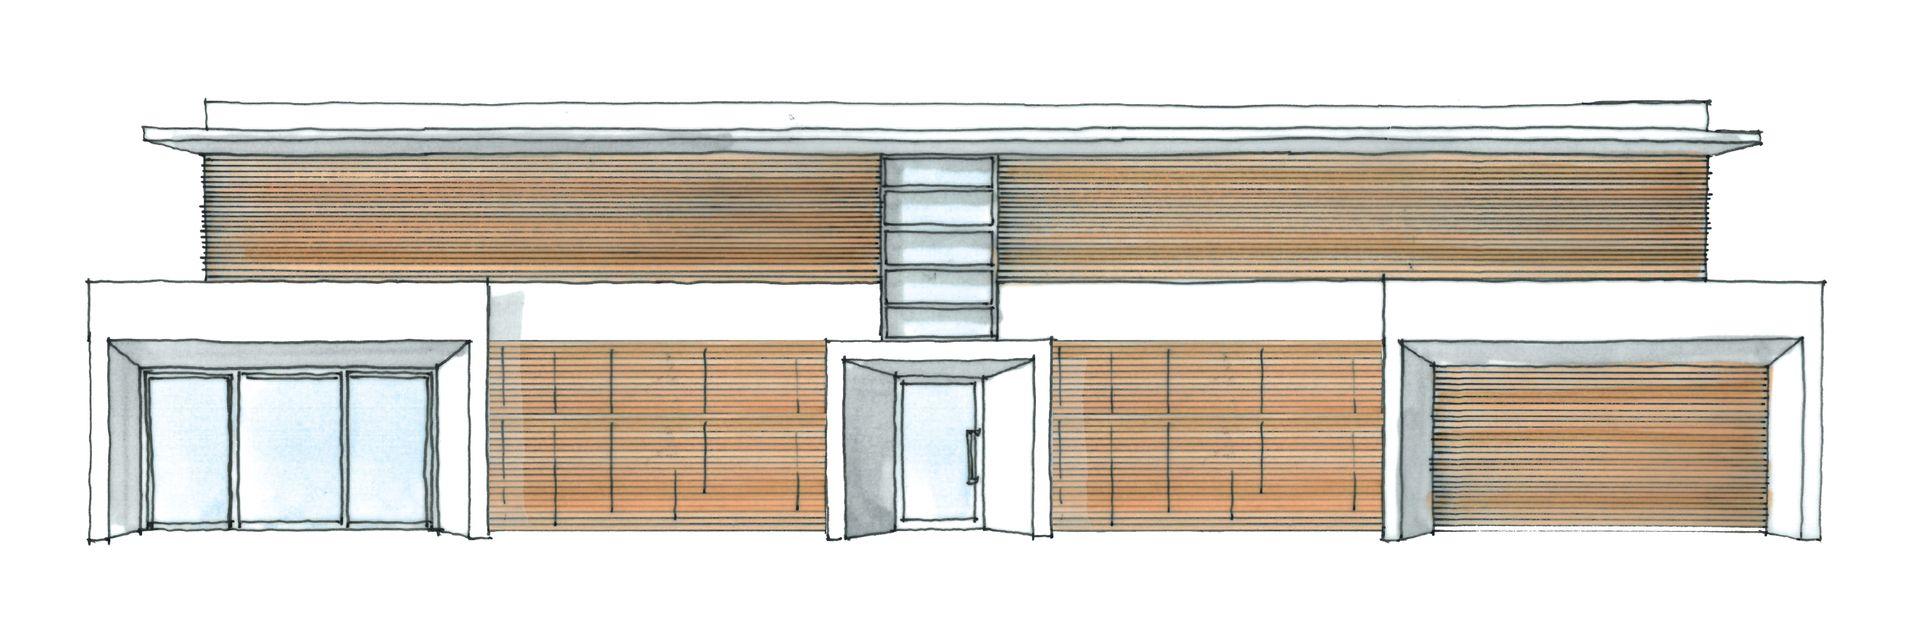 Lot 3 Jemimas Place, Turramurra NSW 2074, Image 0